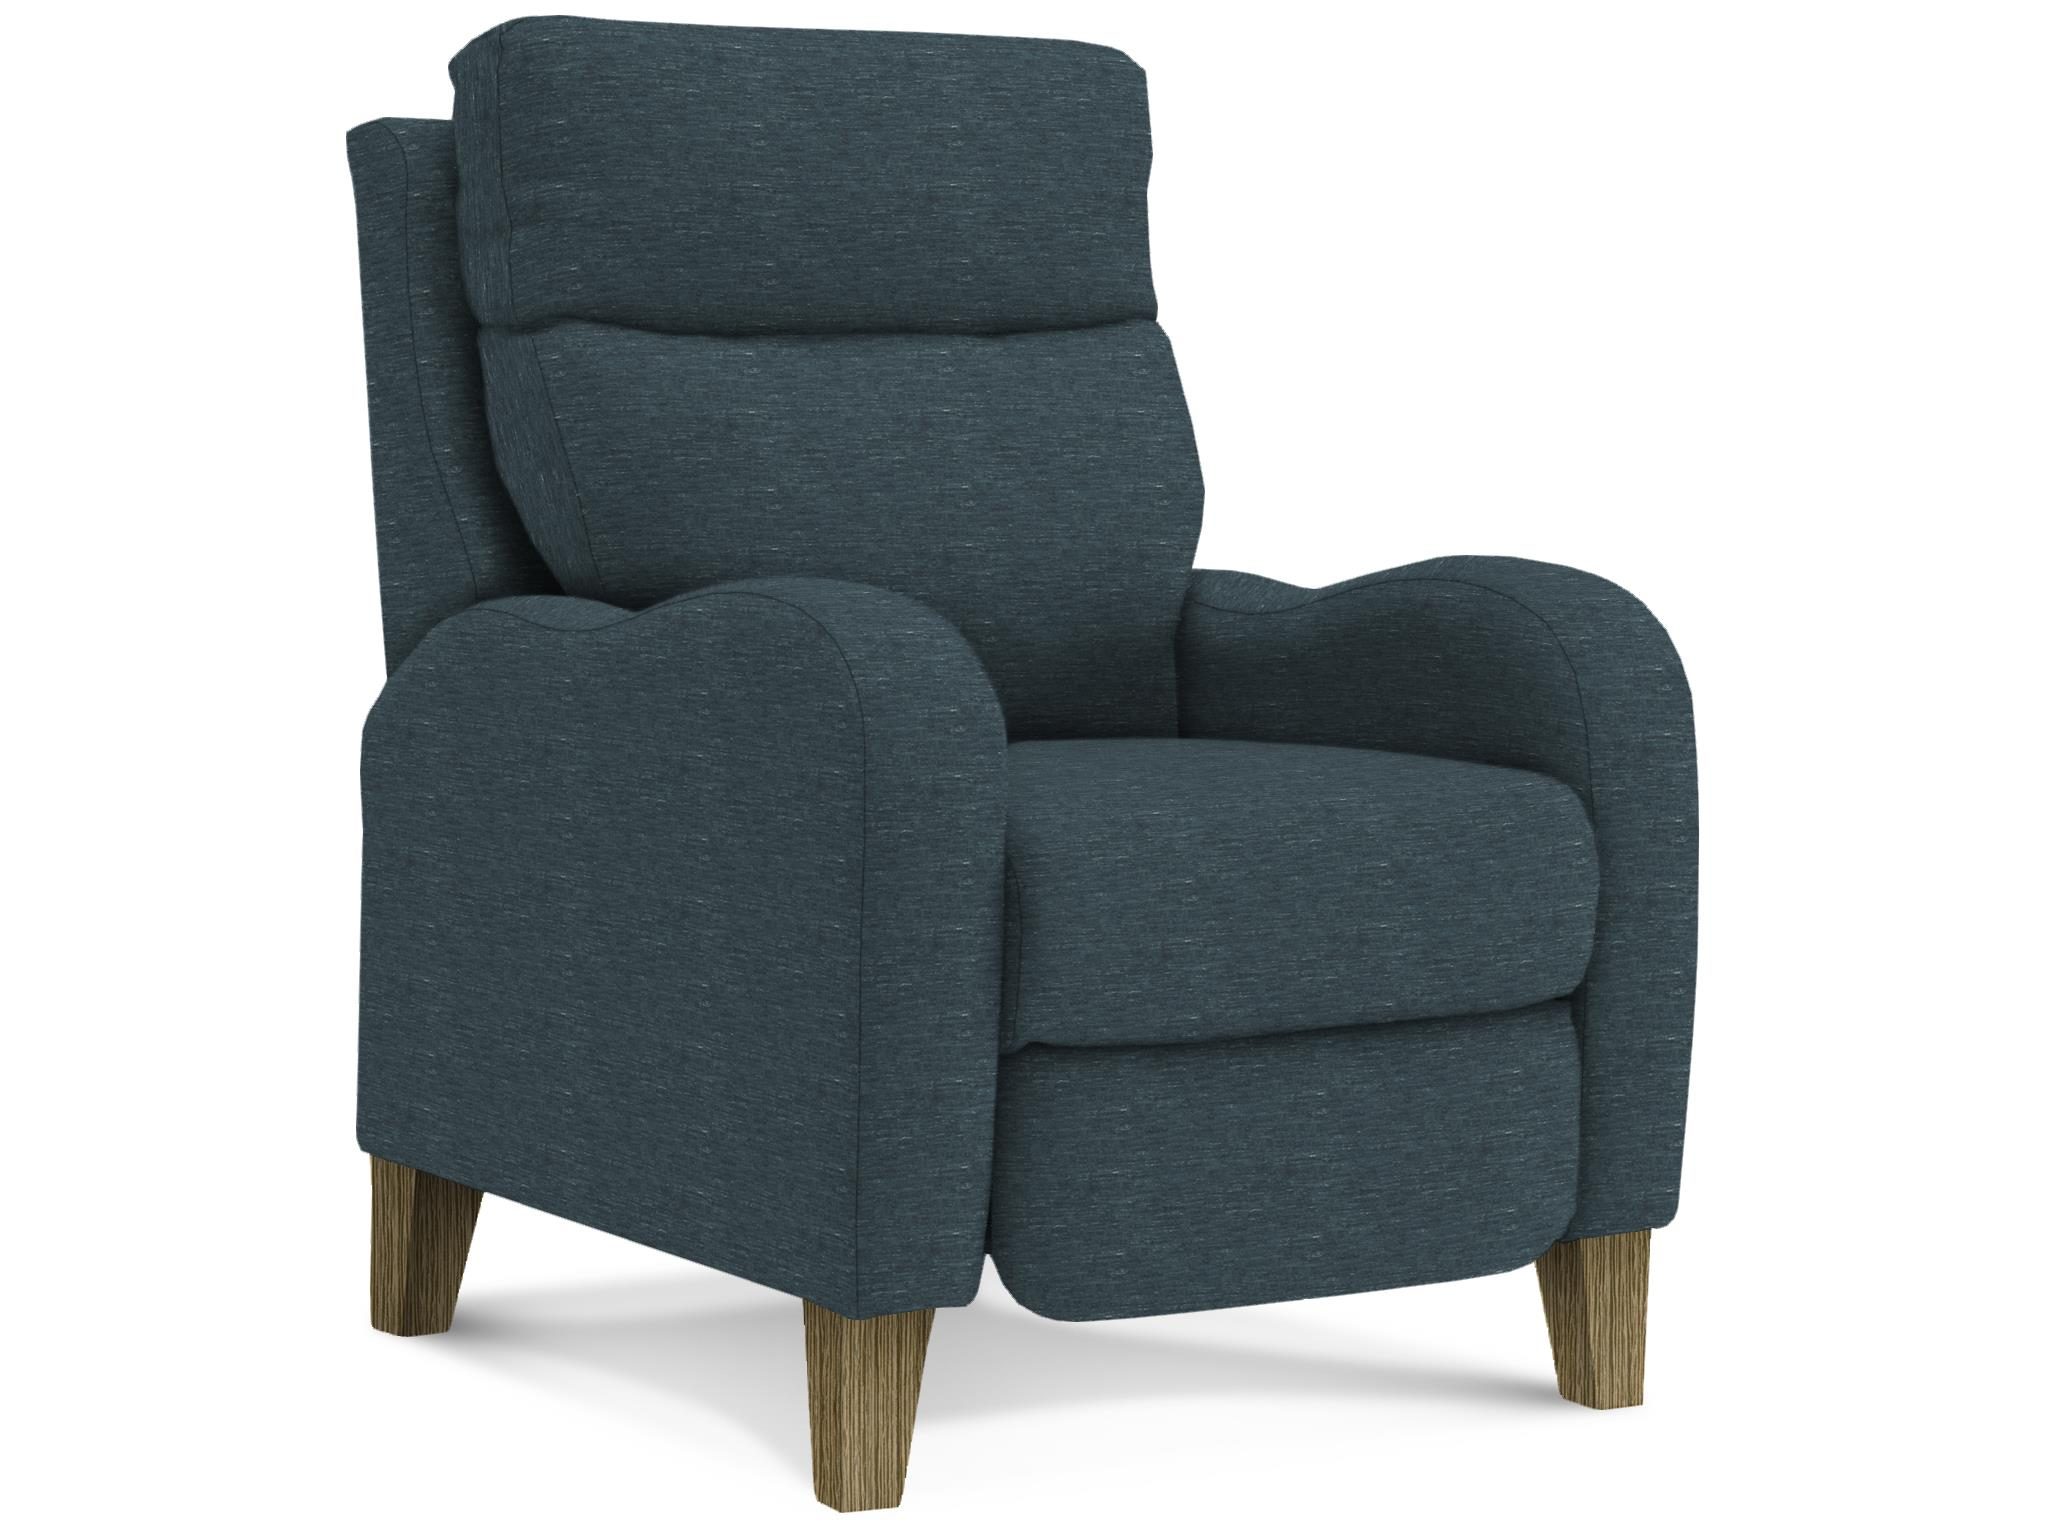 Best Home Furnishings 3l90r 25112